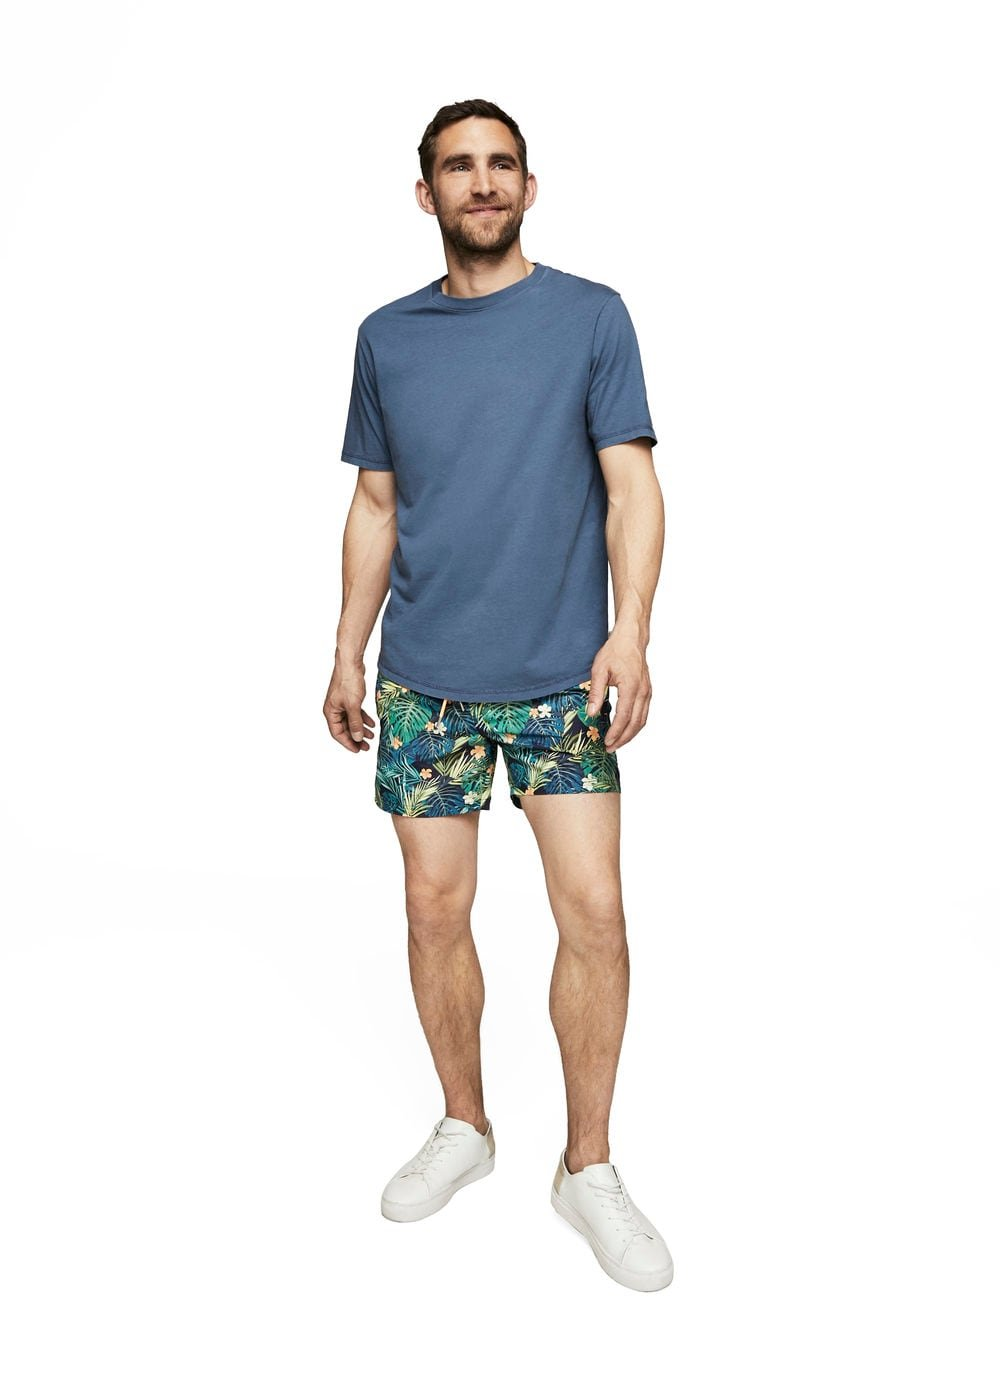 MANGO Men's Tropical Print Swimsuit, Green, XS